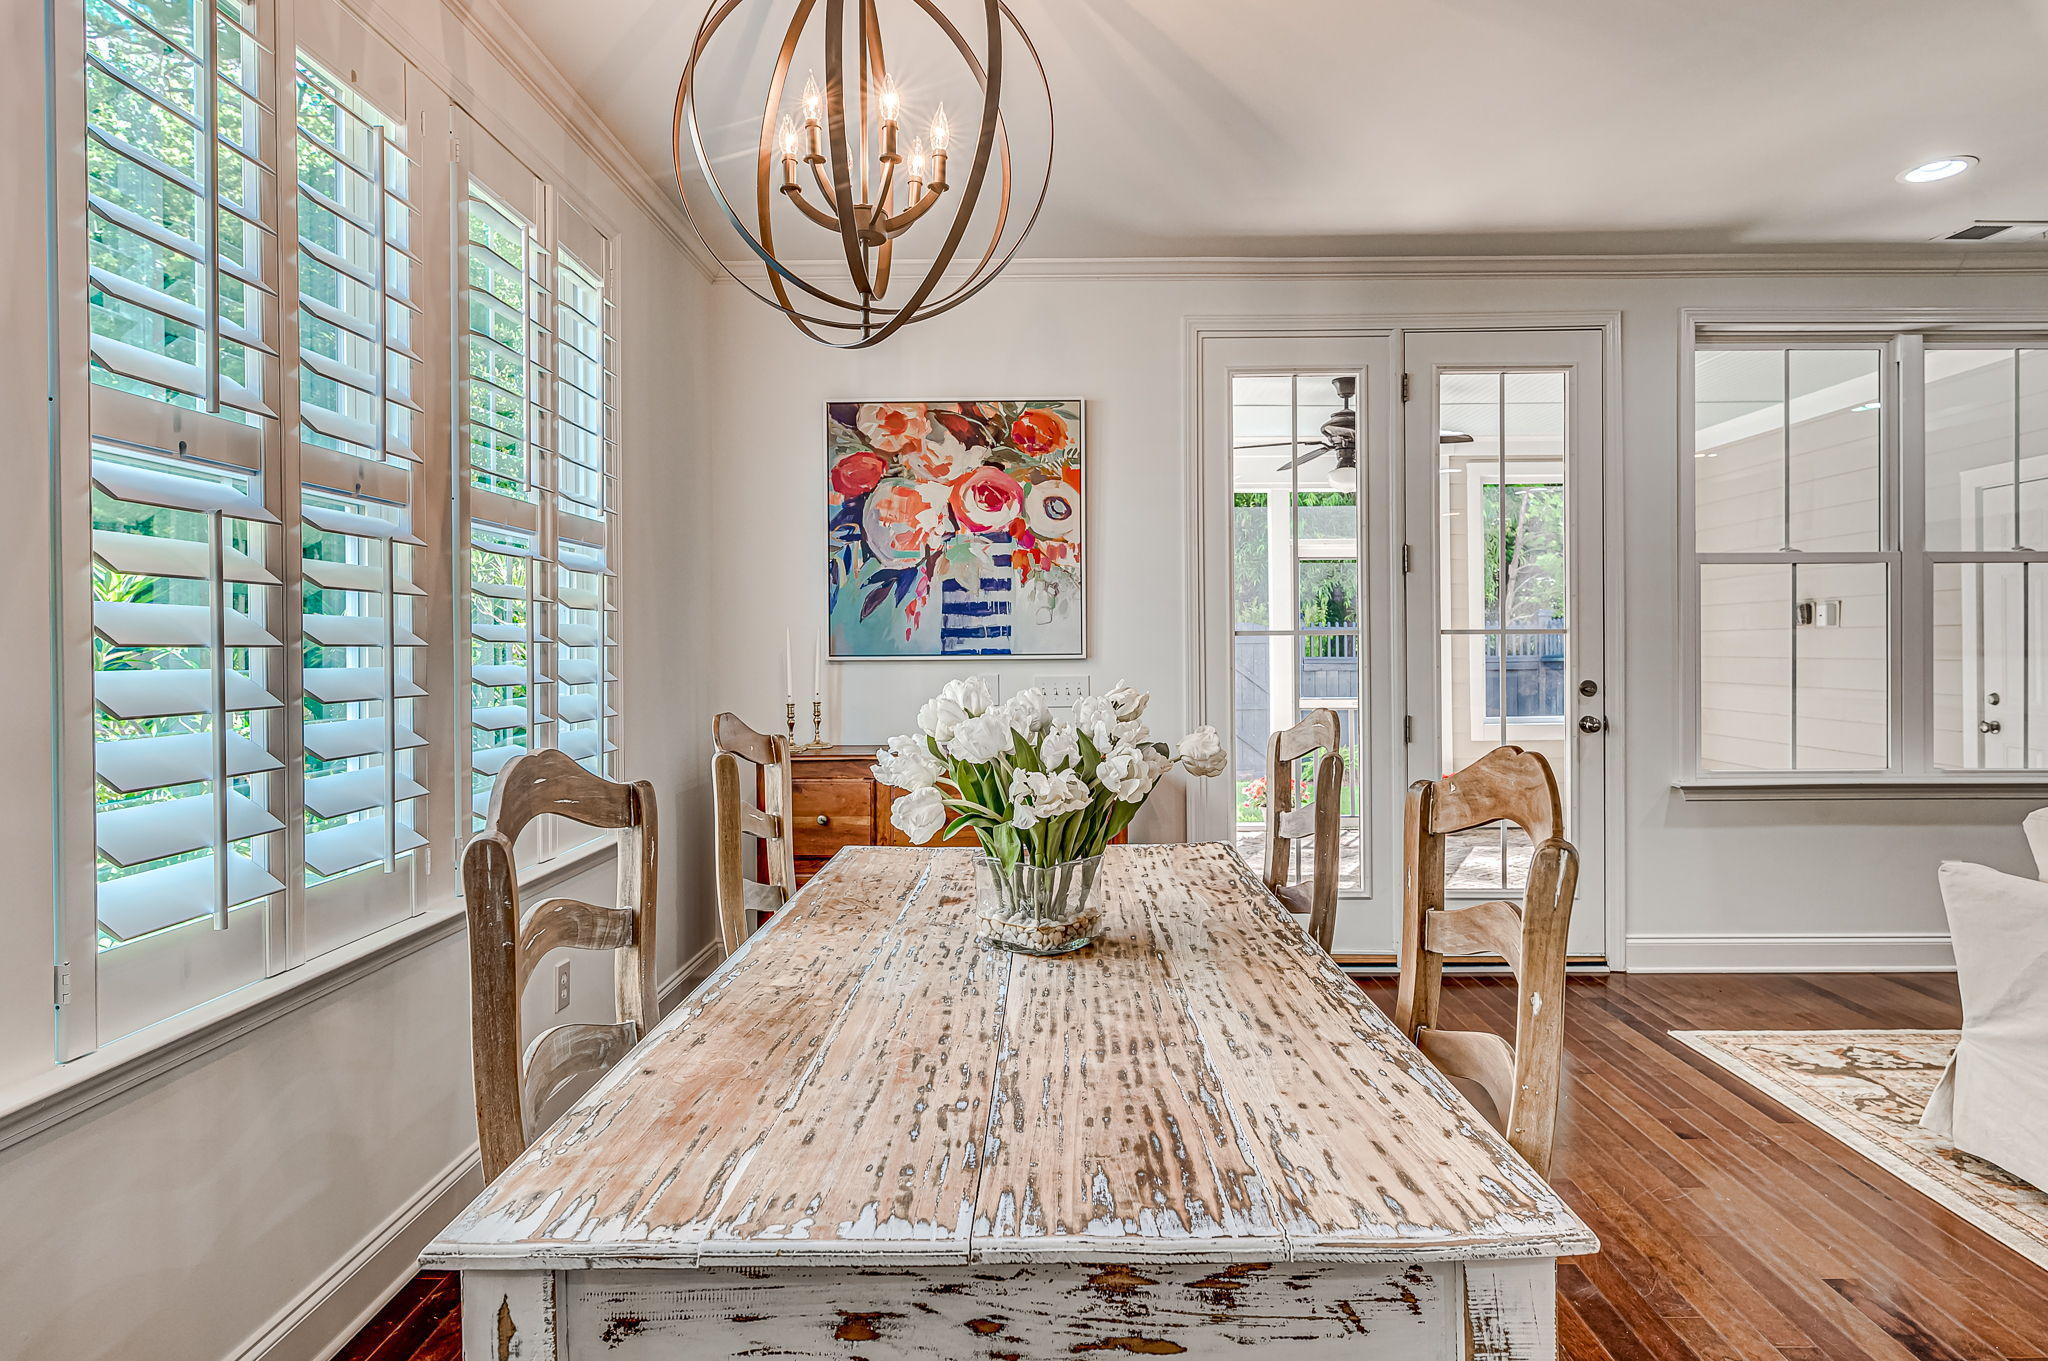 Dunes West Homes For Sale - 2476 Kings Gate, Mount Pleasant, SC - 40